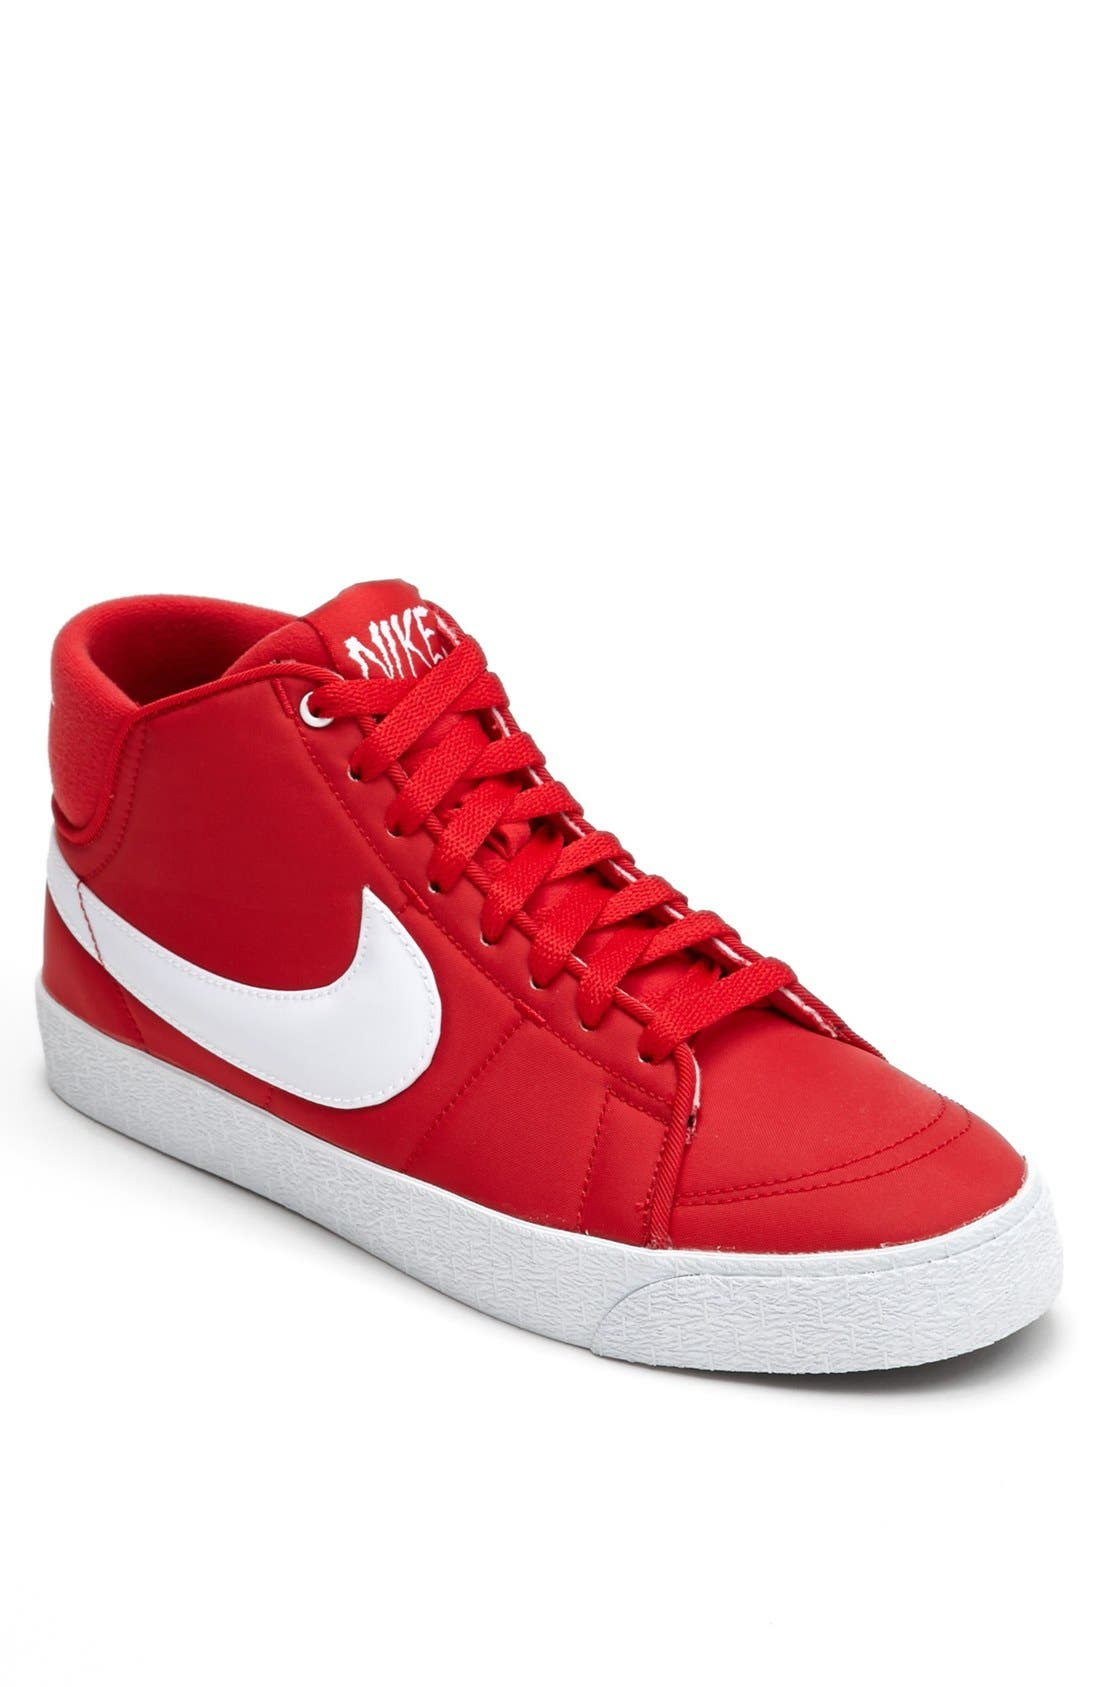 Alternate Image 1 Selected - Nike 'Blazer Mid LR NF' Skate Shoe (Men)